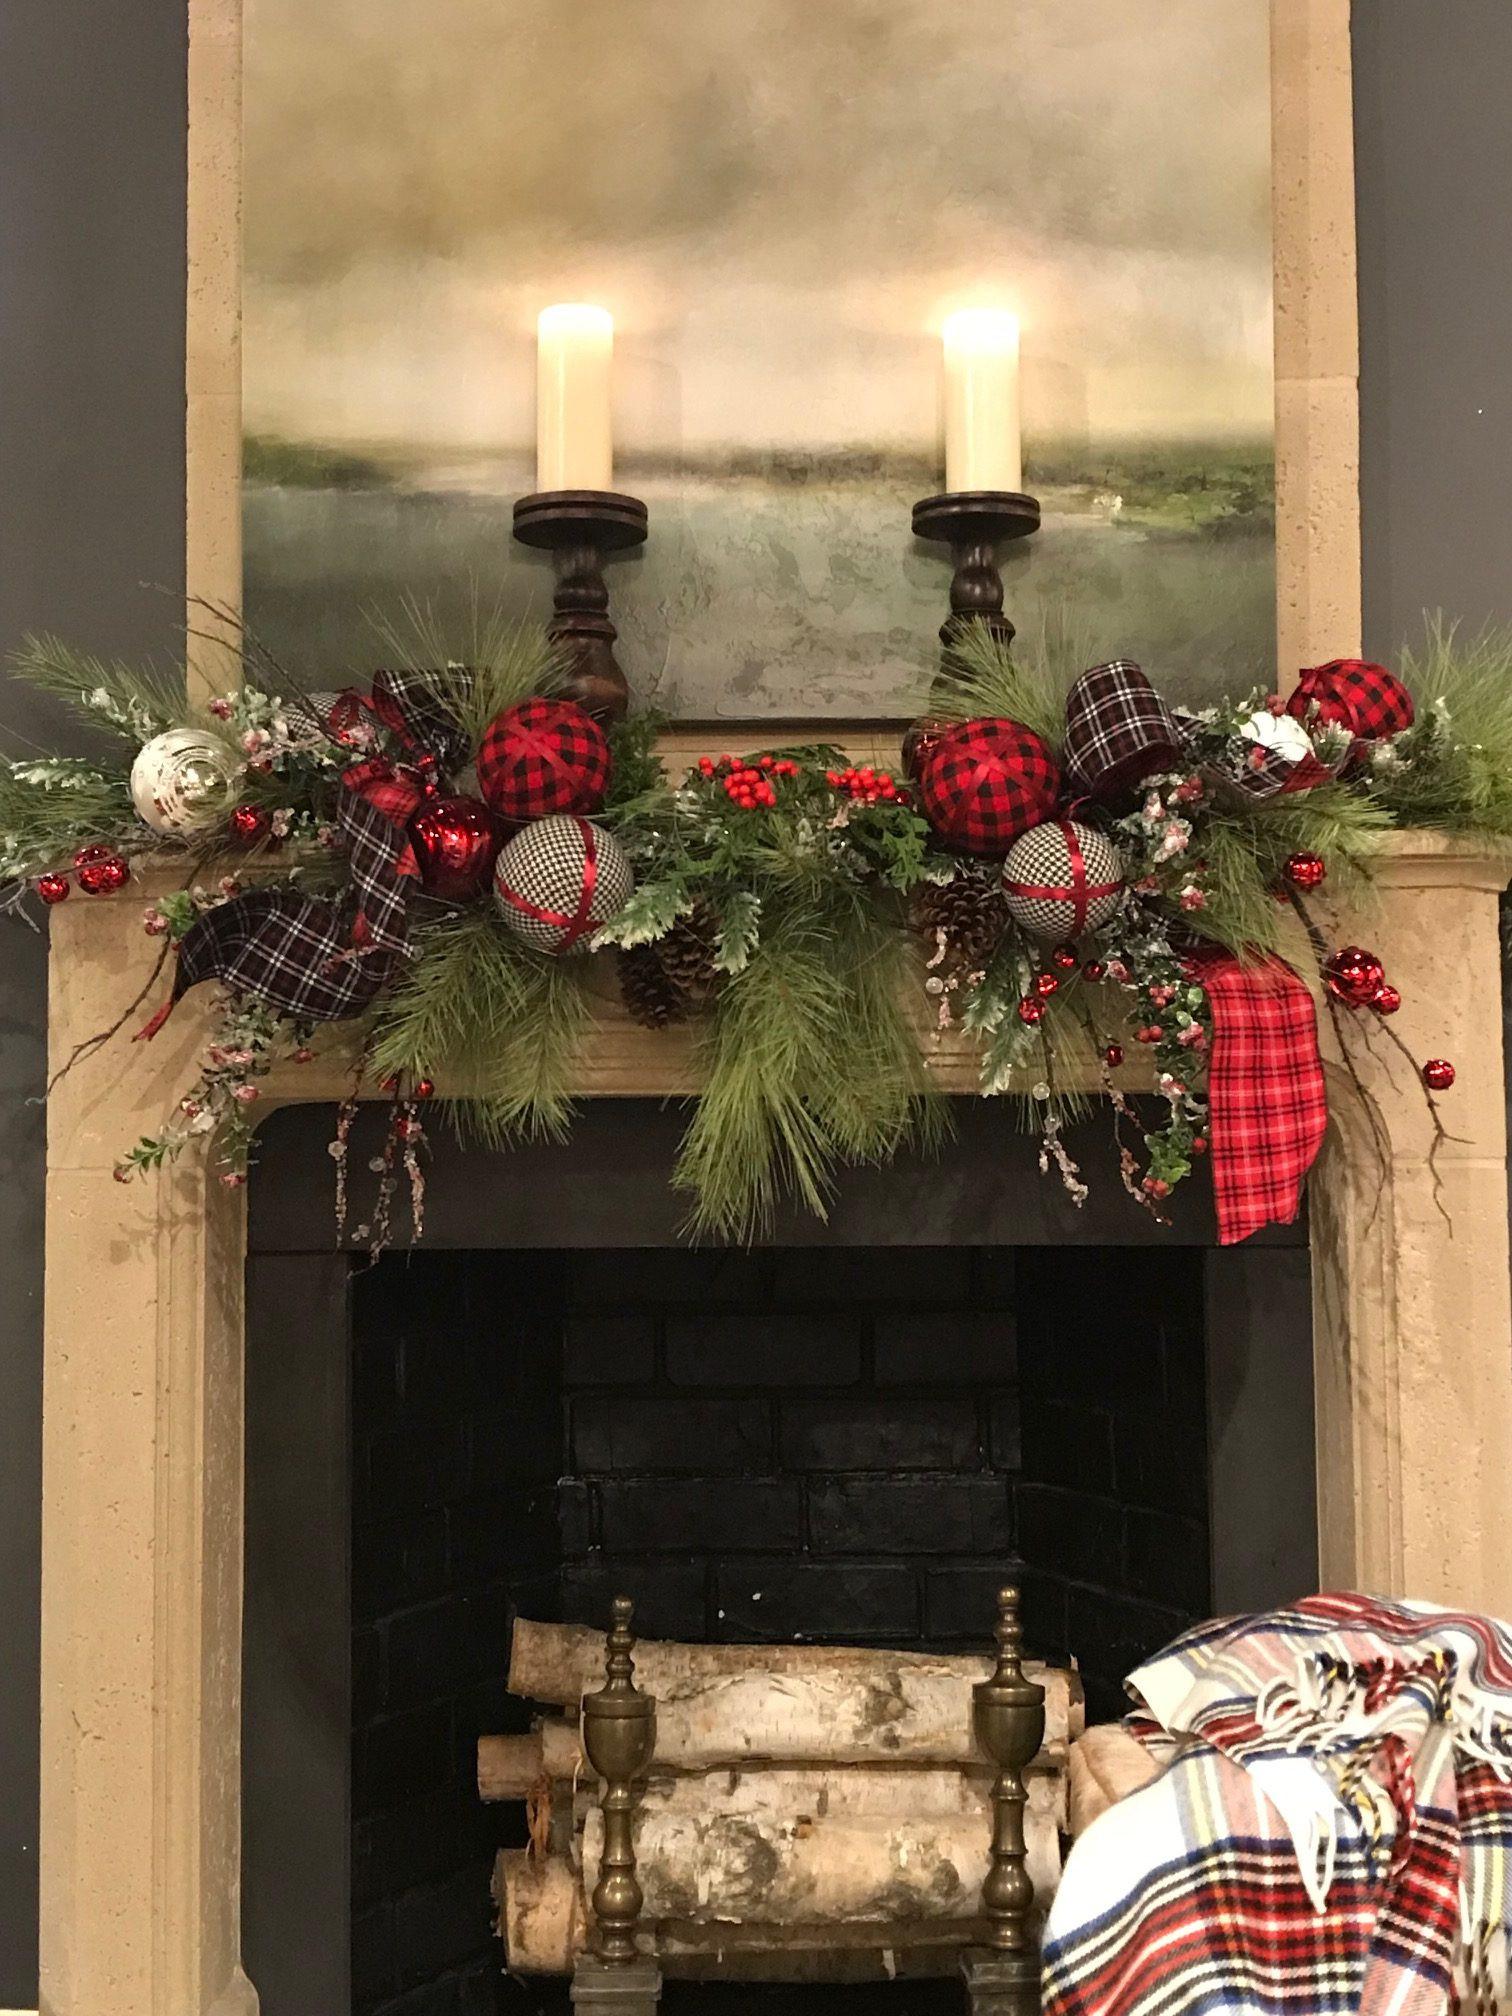 Christmas Fireplace Decor Pinterest Unique Ingre Nts Of A Marvelous Mantel Nell Hills